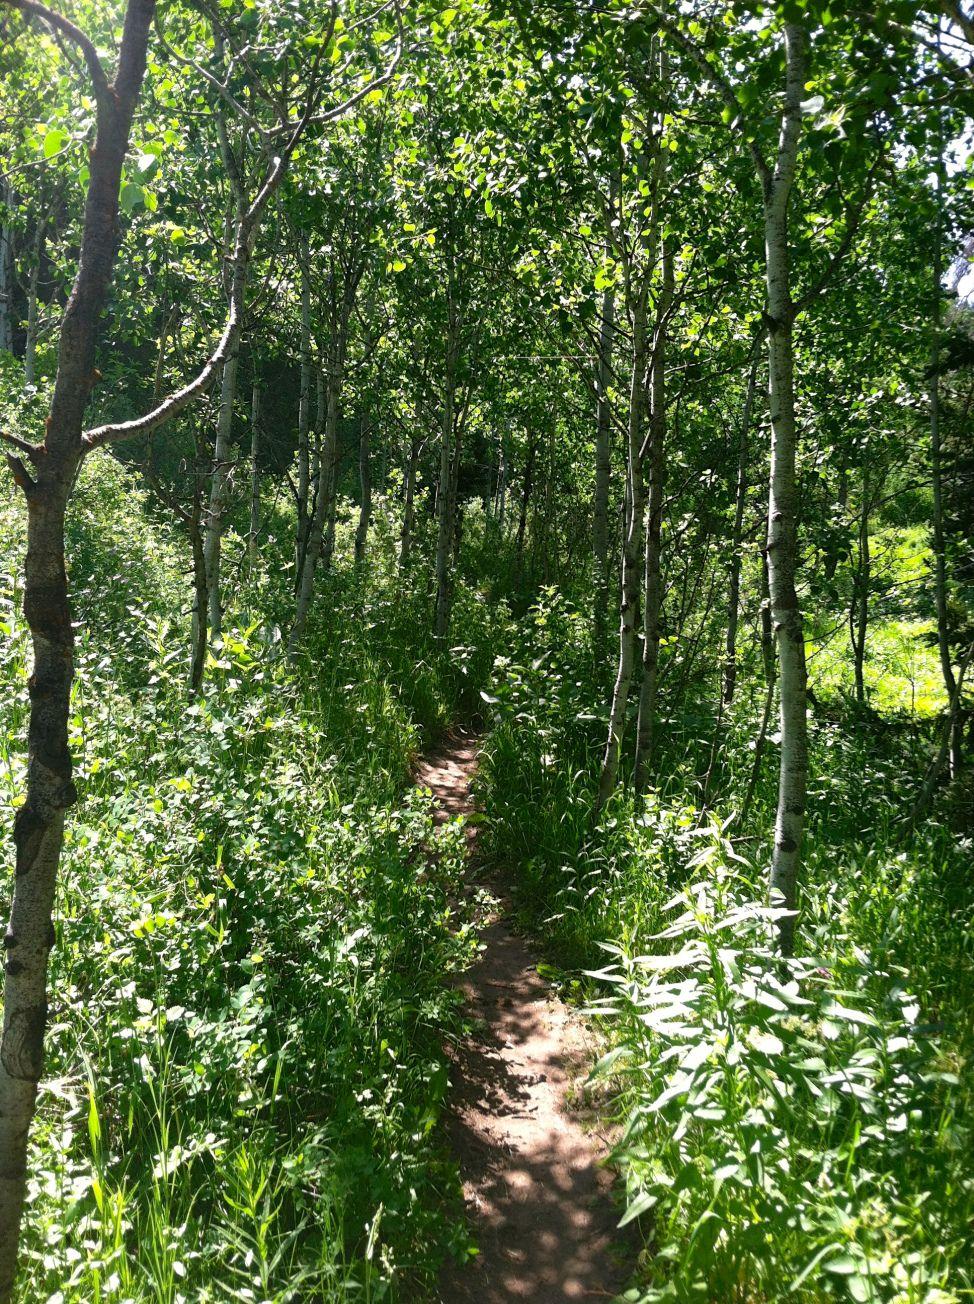 Hiking in toll canyon summertime wildflowers in utah